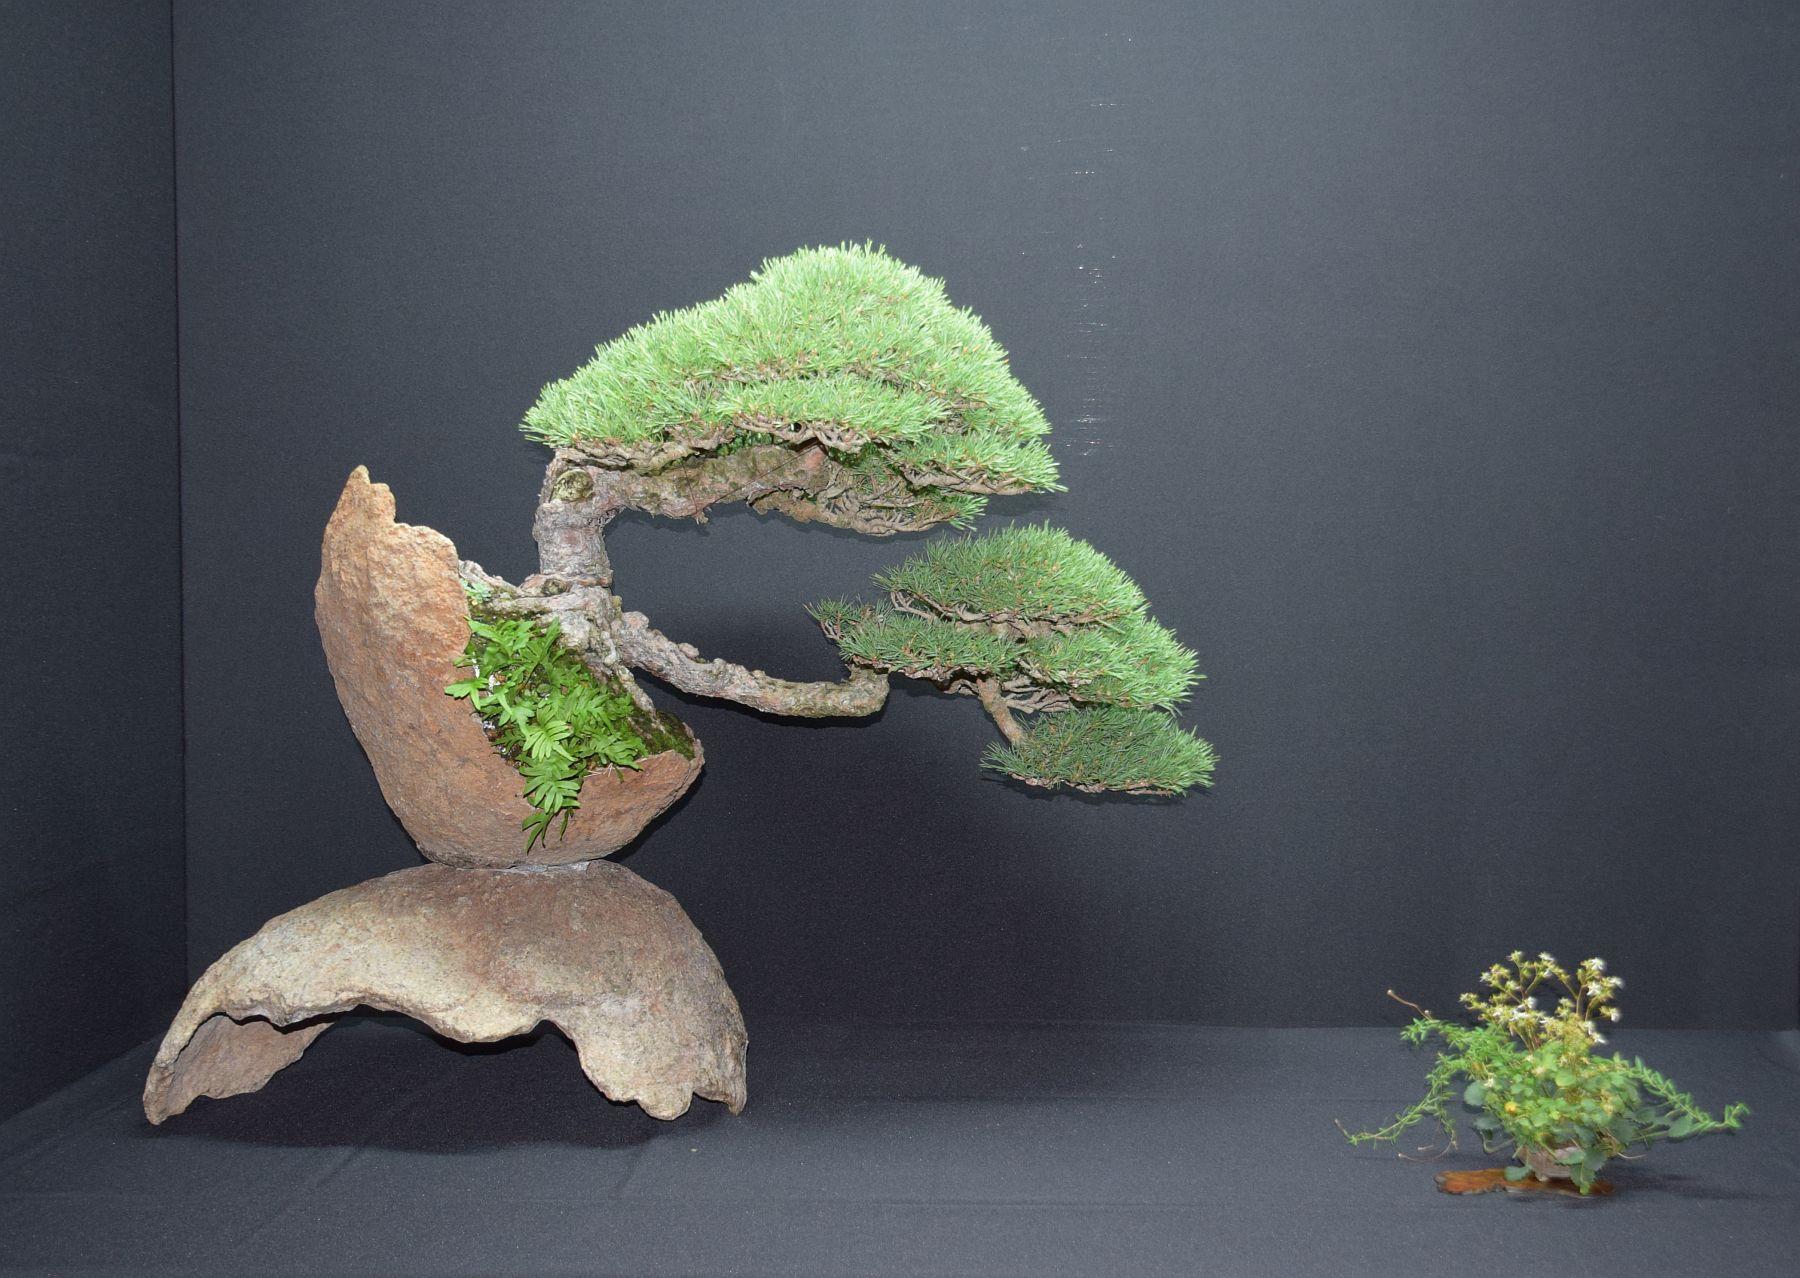 bonsai-museum-luis-vallejo-006